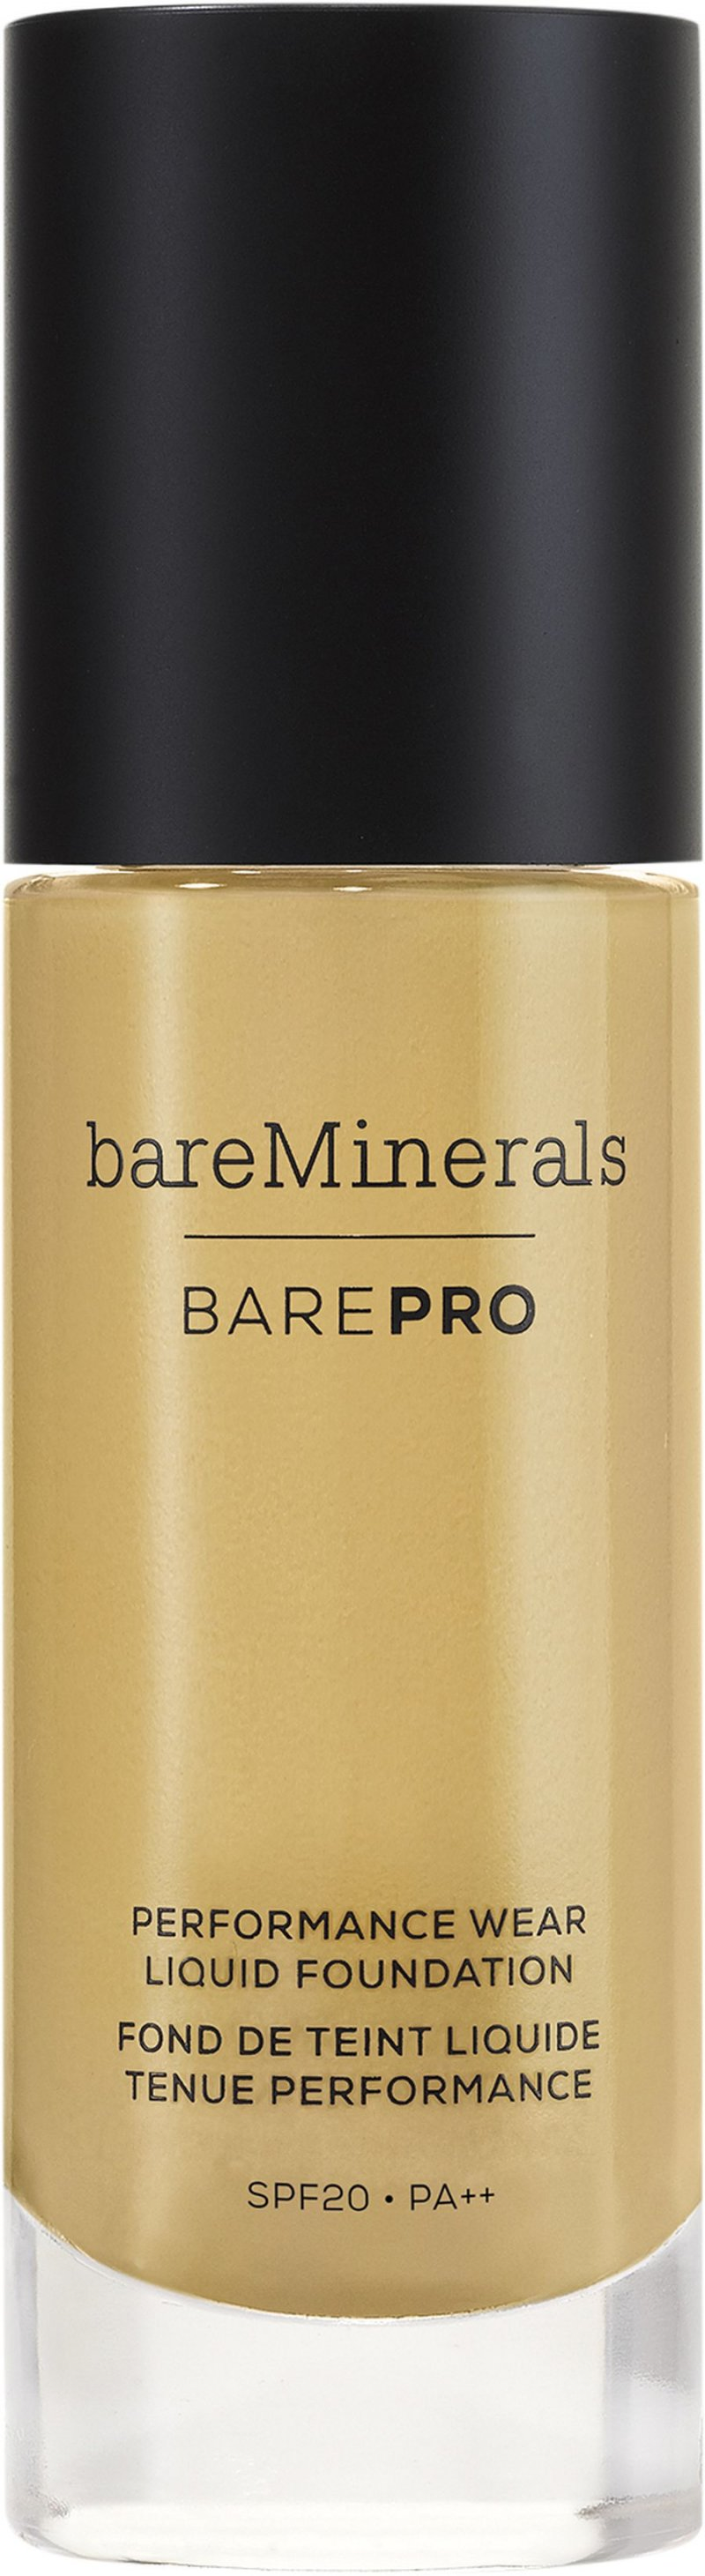 Image of   Bareminerals Foundation - Barepro Performance Wear Liquid - Honeycomb 20